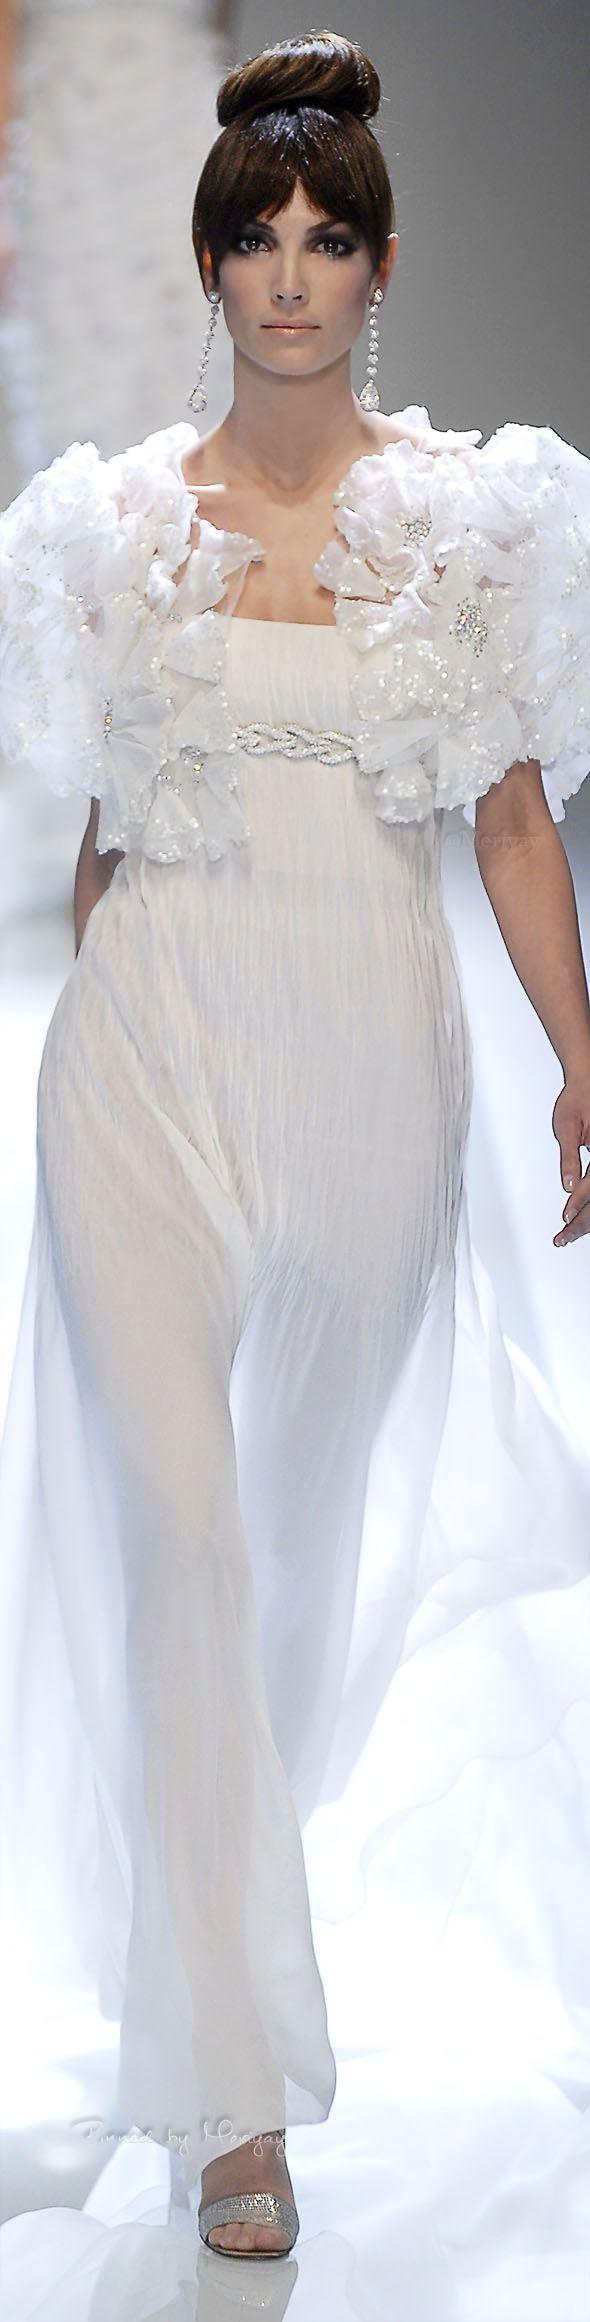 Robe femme printemps 2018